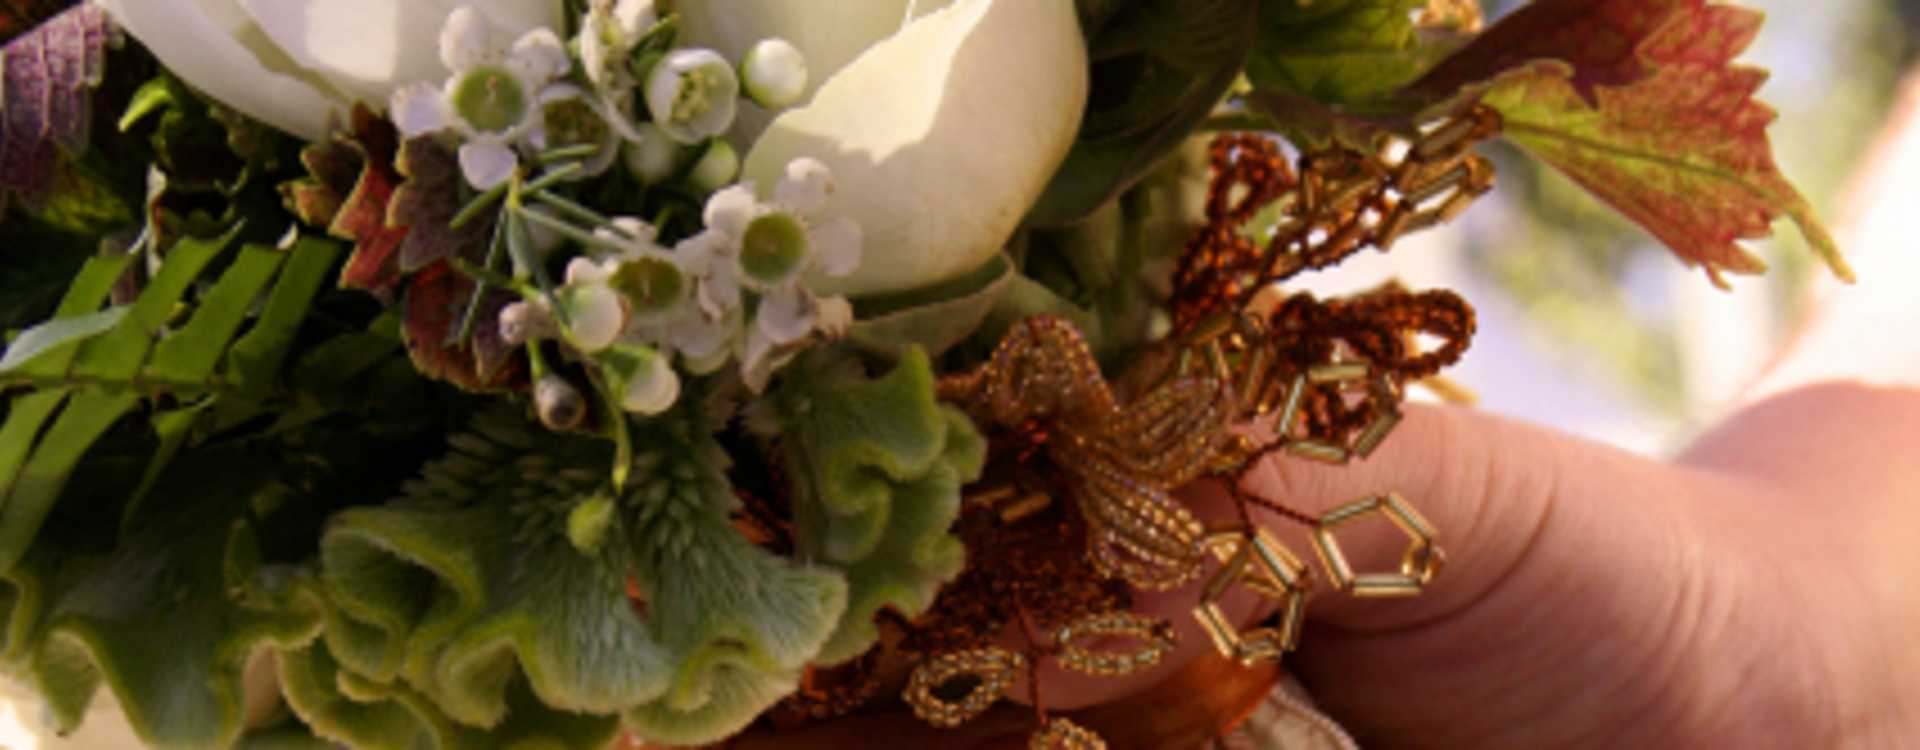 Flora_Laura__Marine_View_Florist_-6.jpg